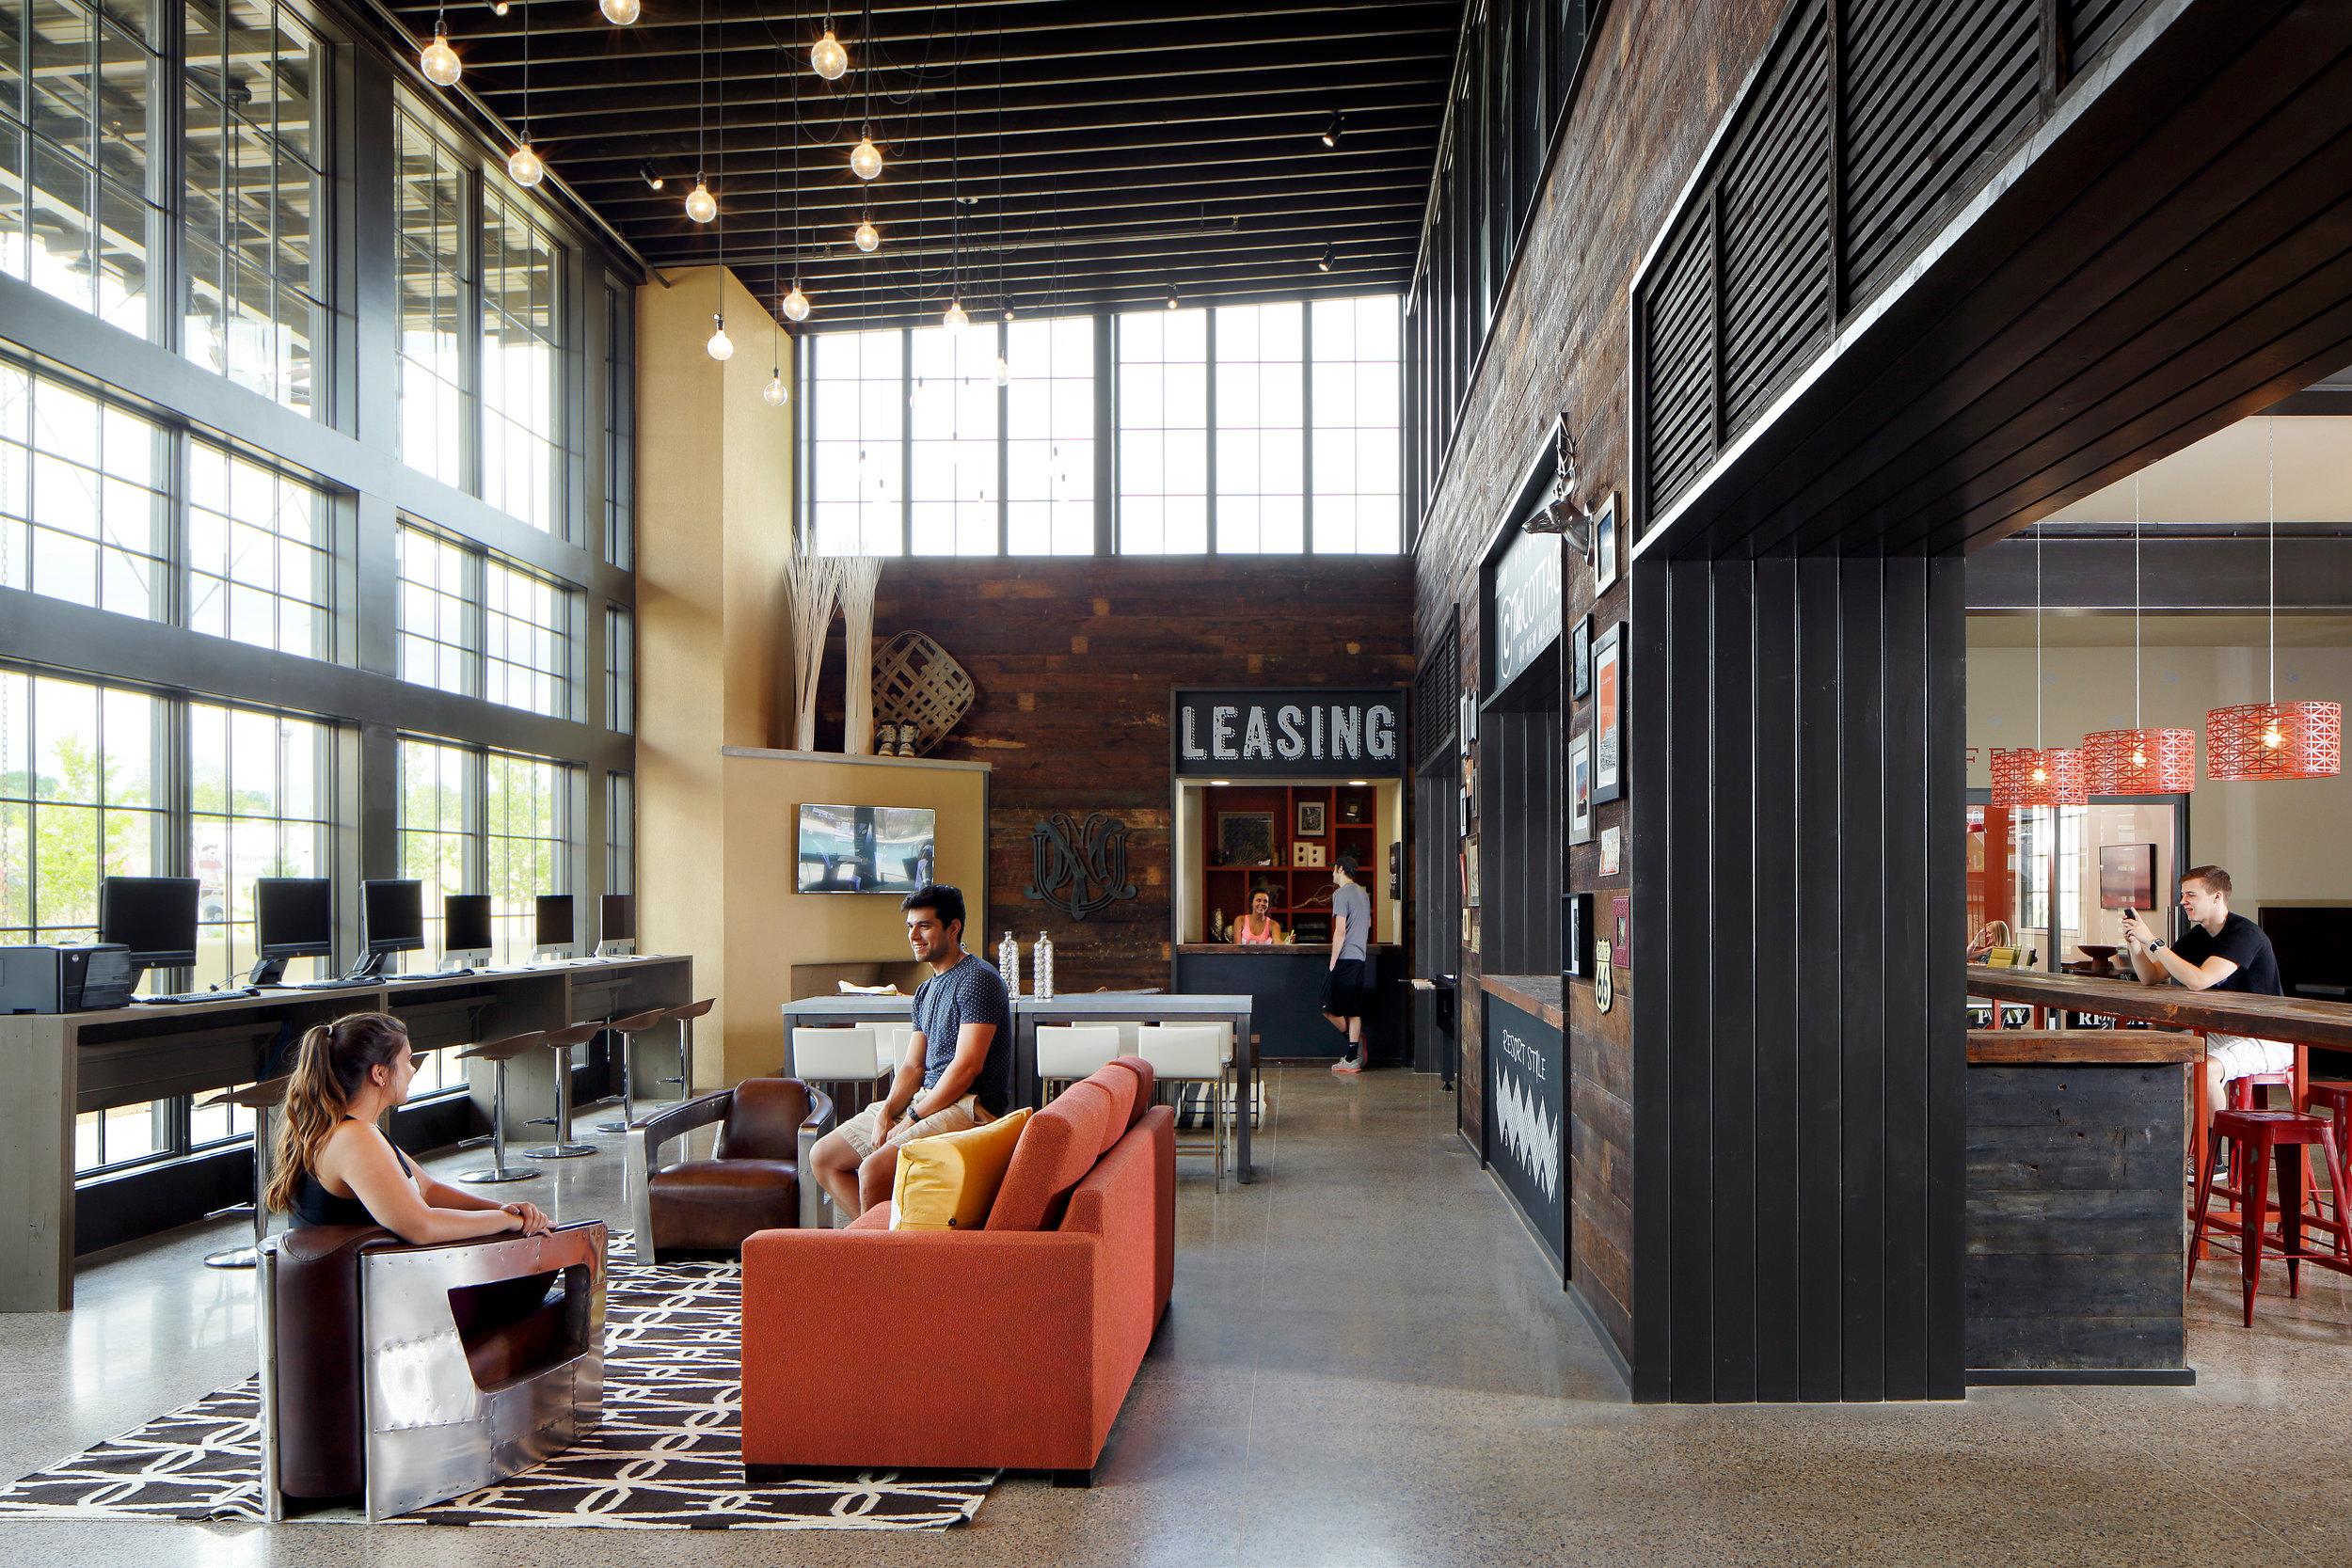 Real Estate Development Projects Pierce Education Properties LP